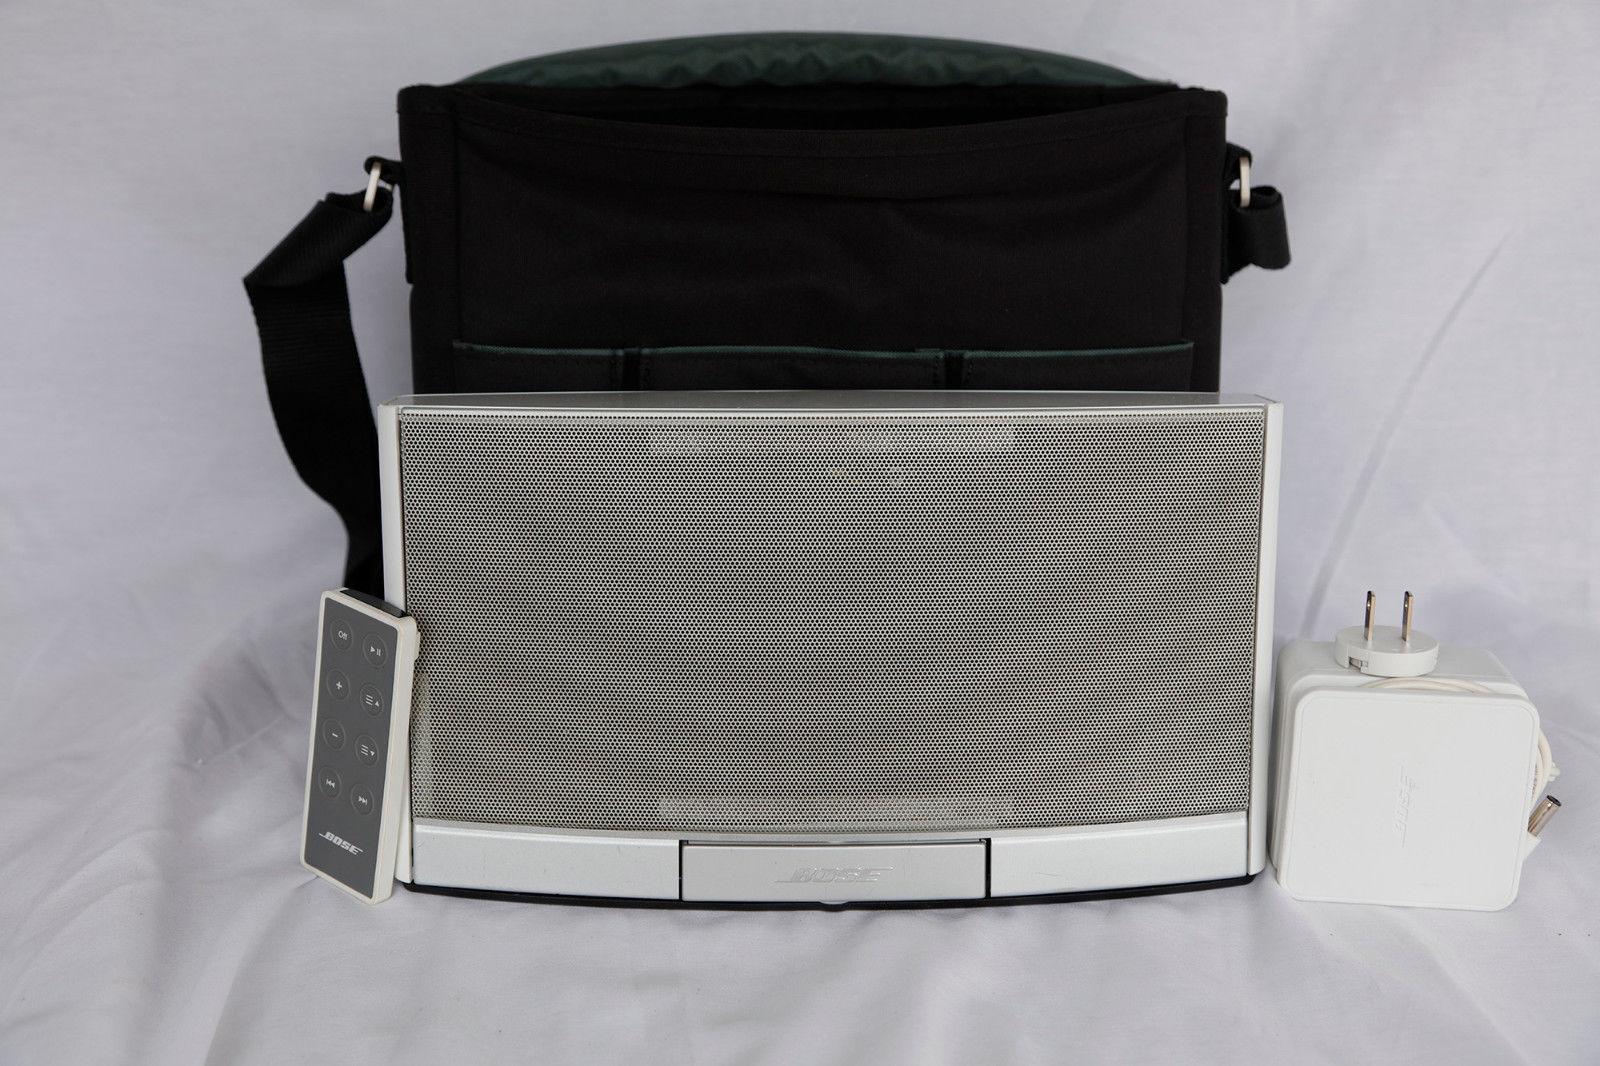 Bose SoundDock Portable Speaker System - Glossy White